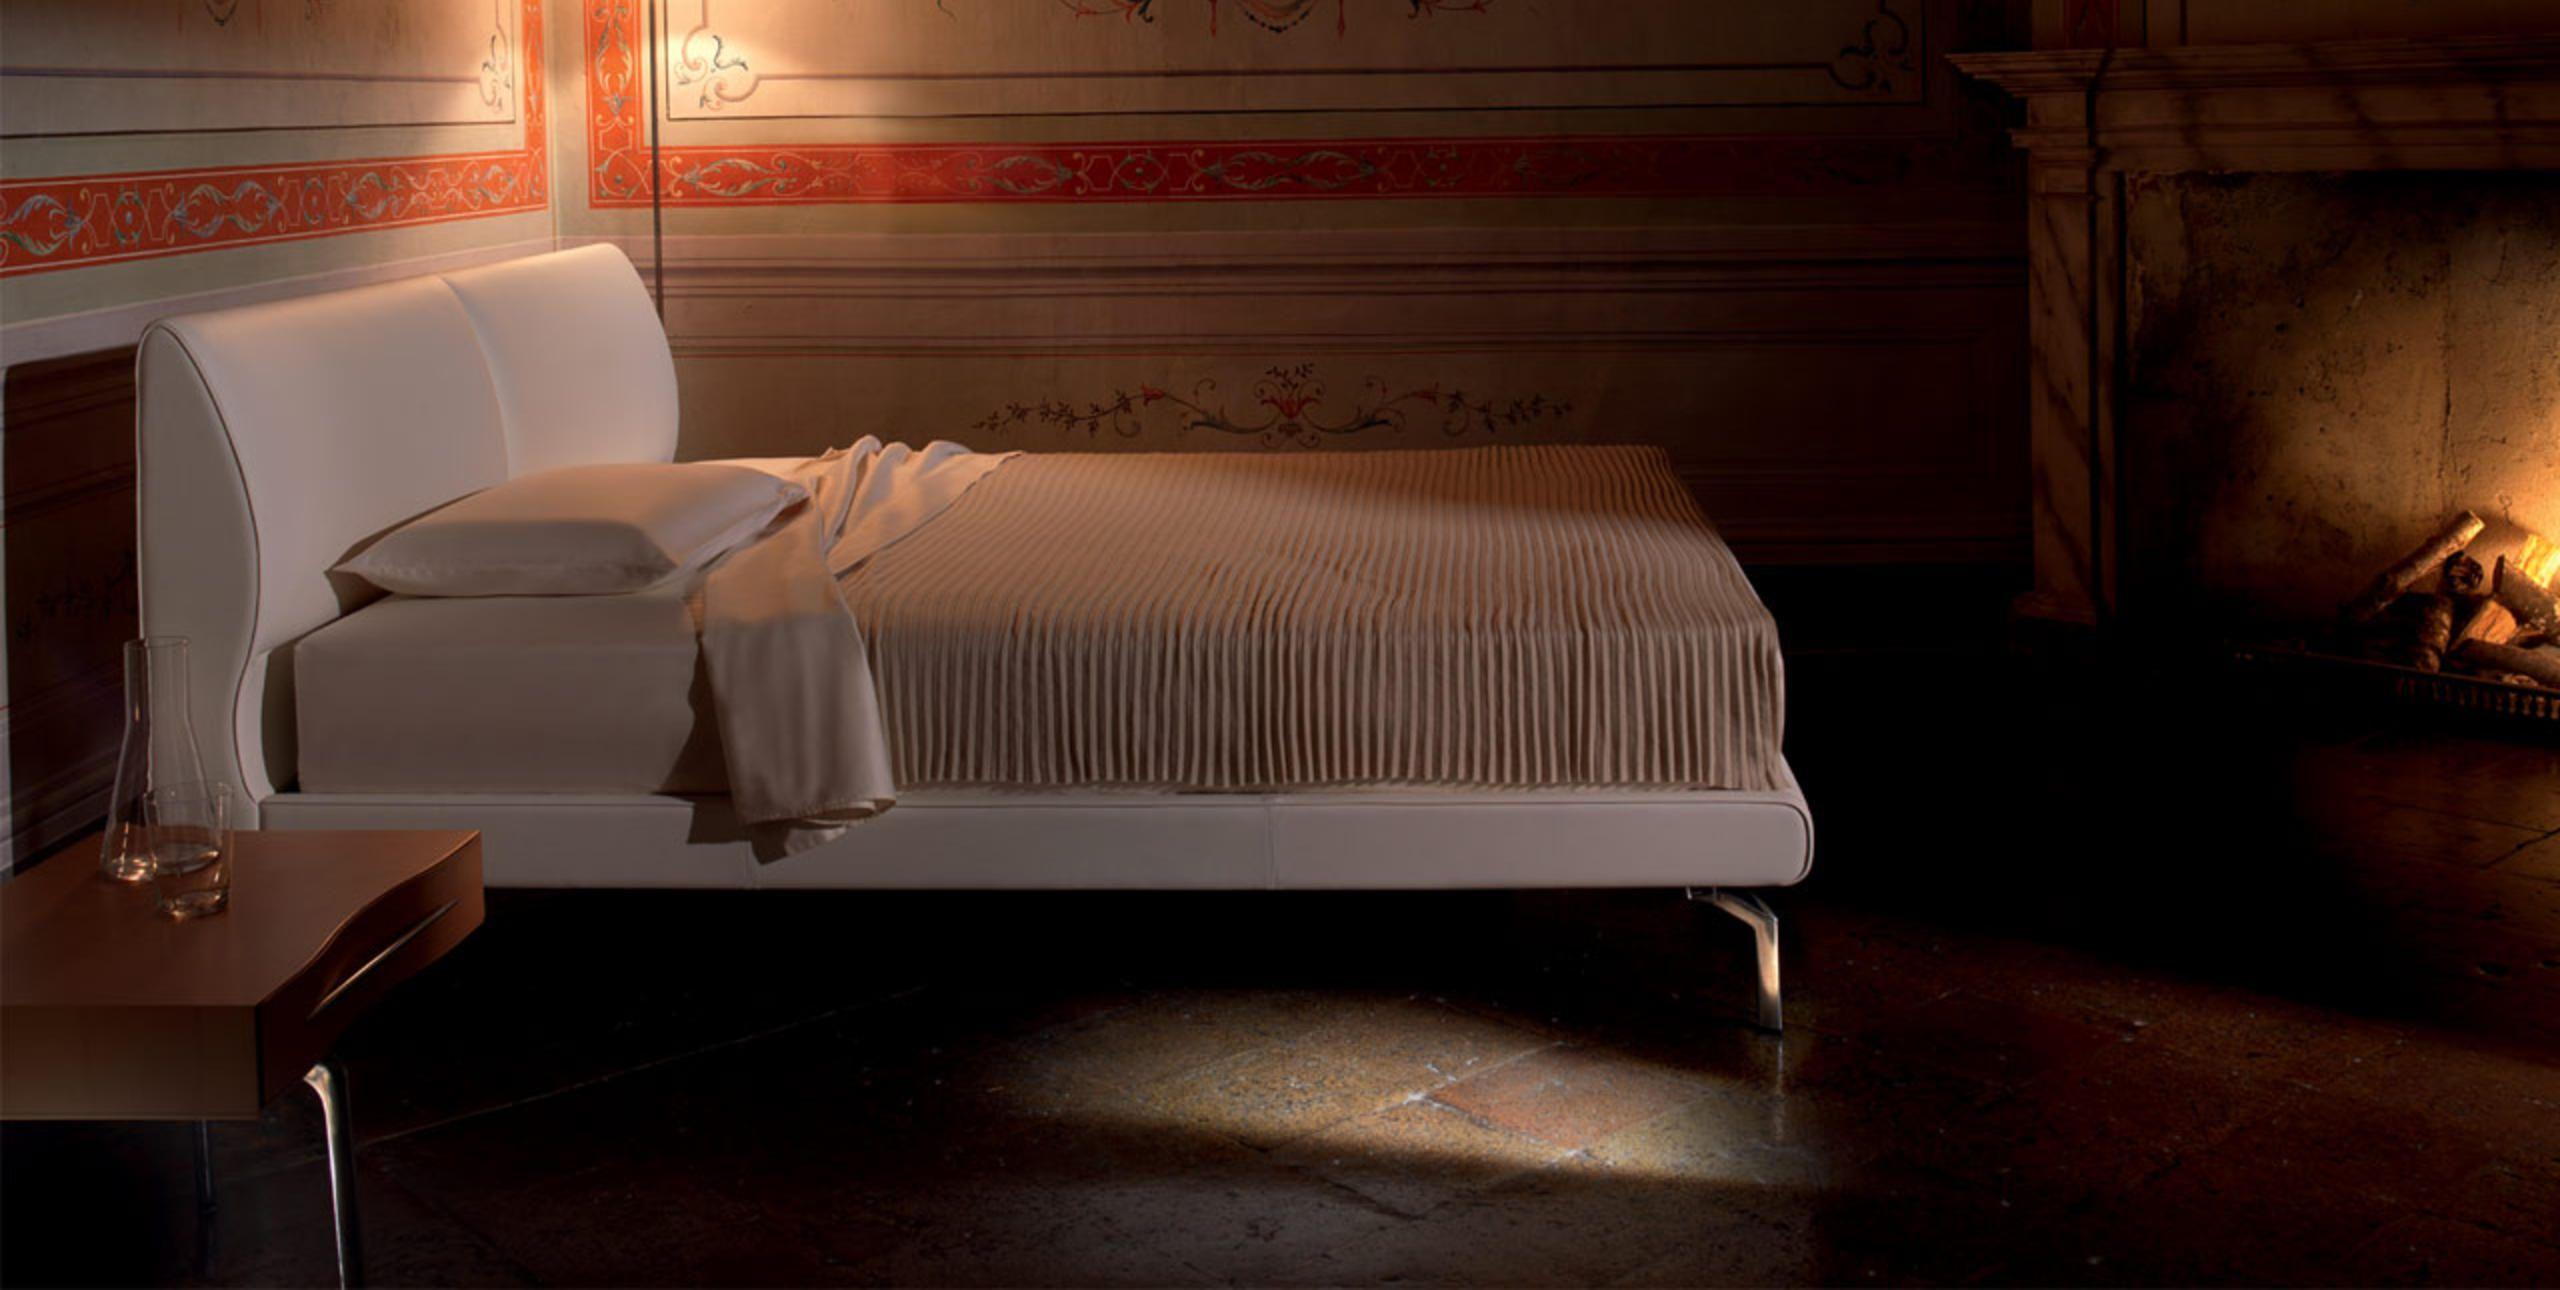 Eosonno Poltrona Frau.Poltrona Frau Eosonno Furniture Beds Bed Bed